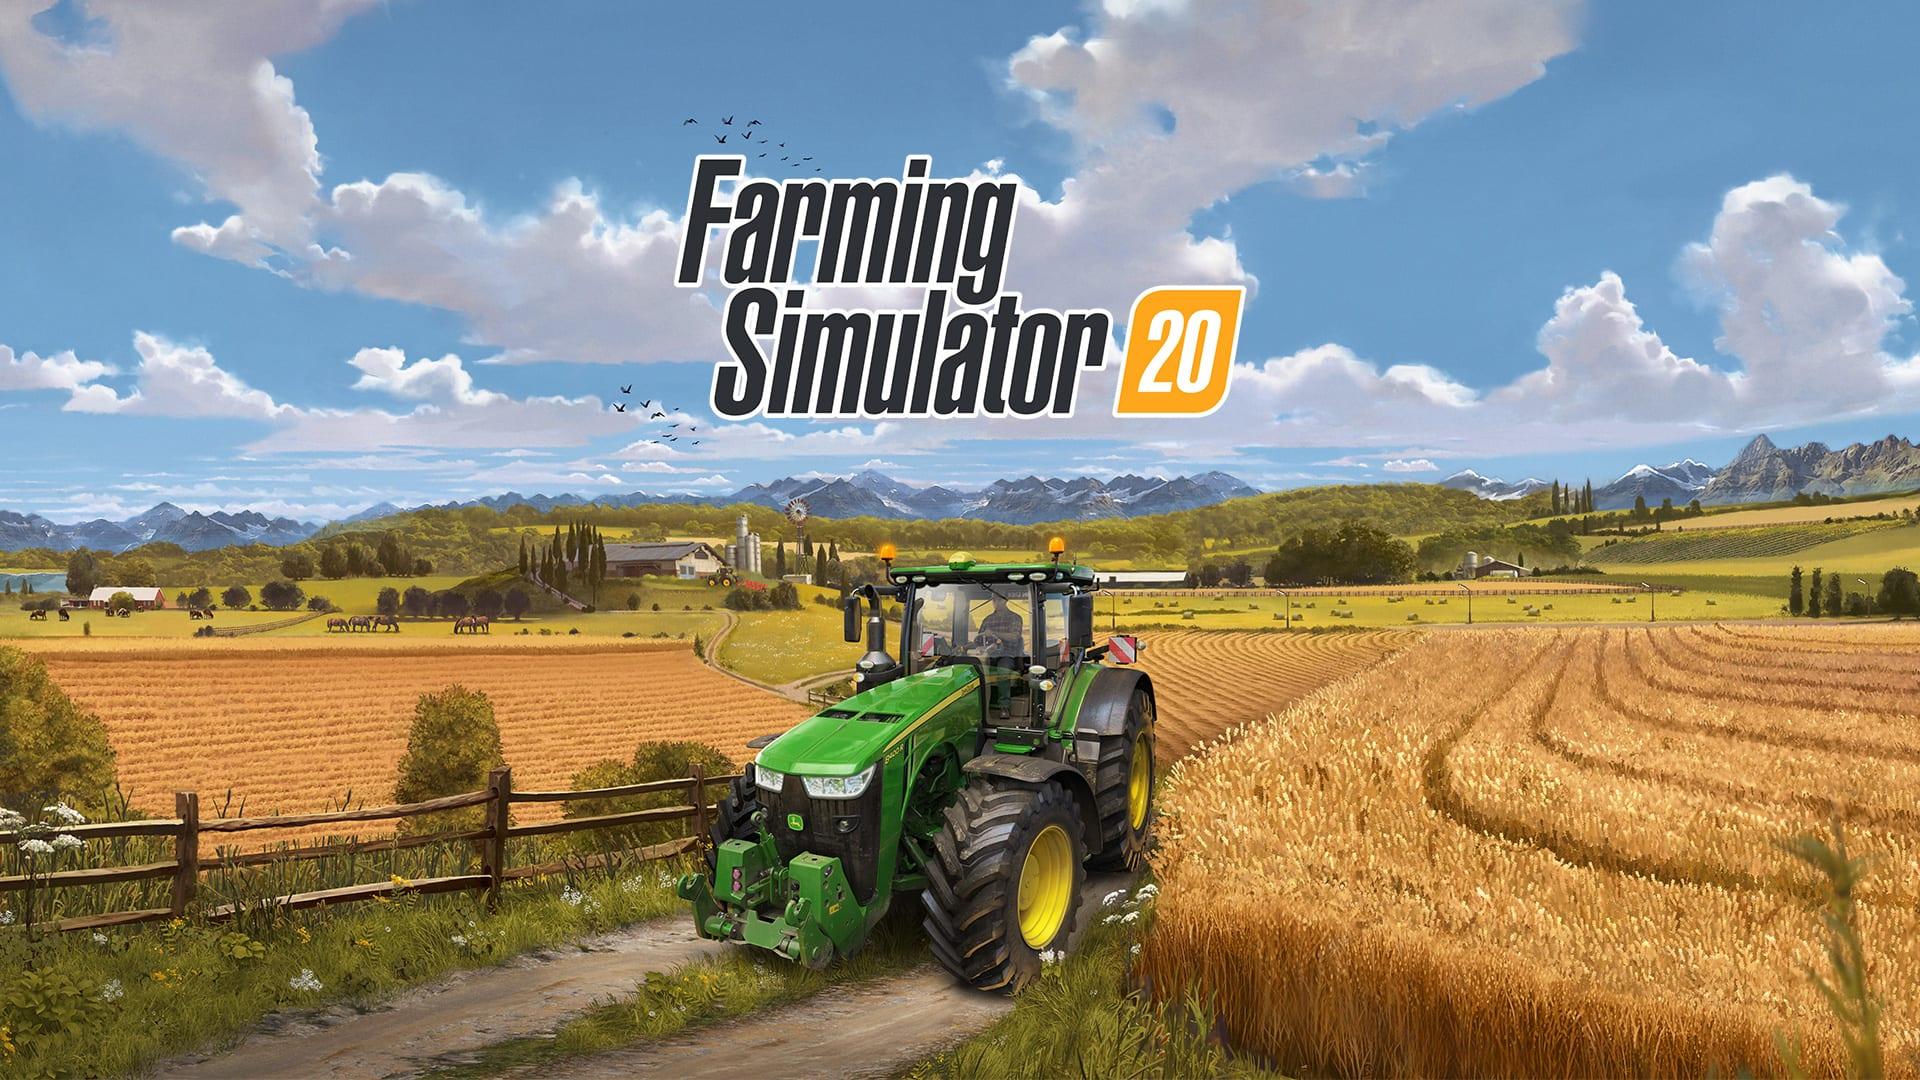 PREMIERA FARMING SIMULATOR 20 NA KONSOLI NINTENDO SWITCH